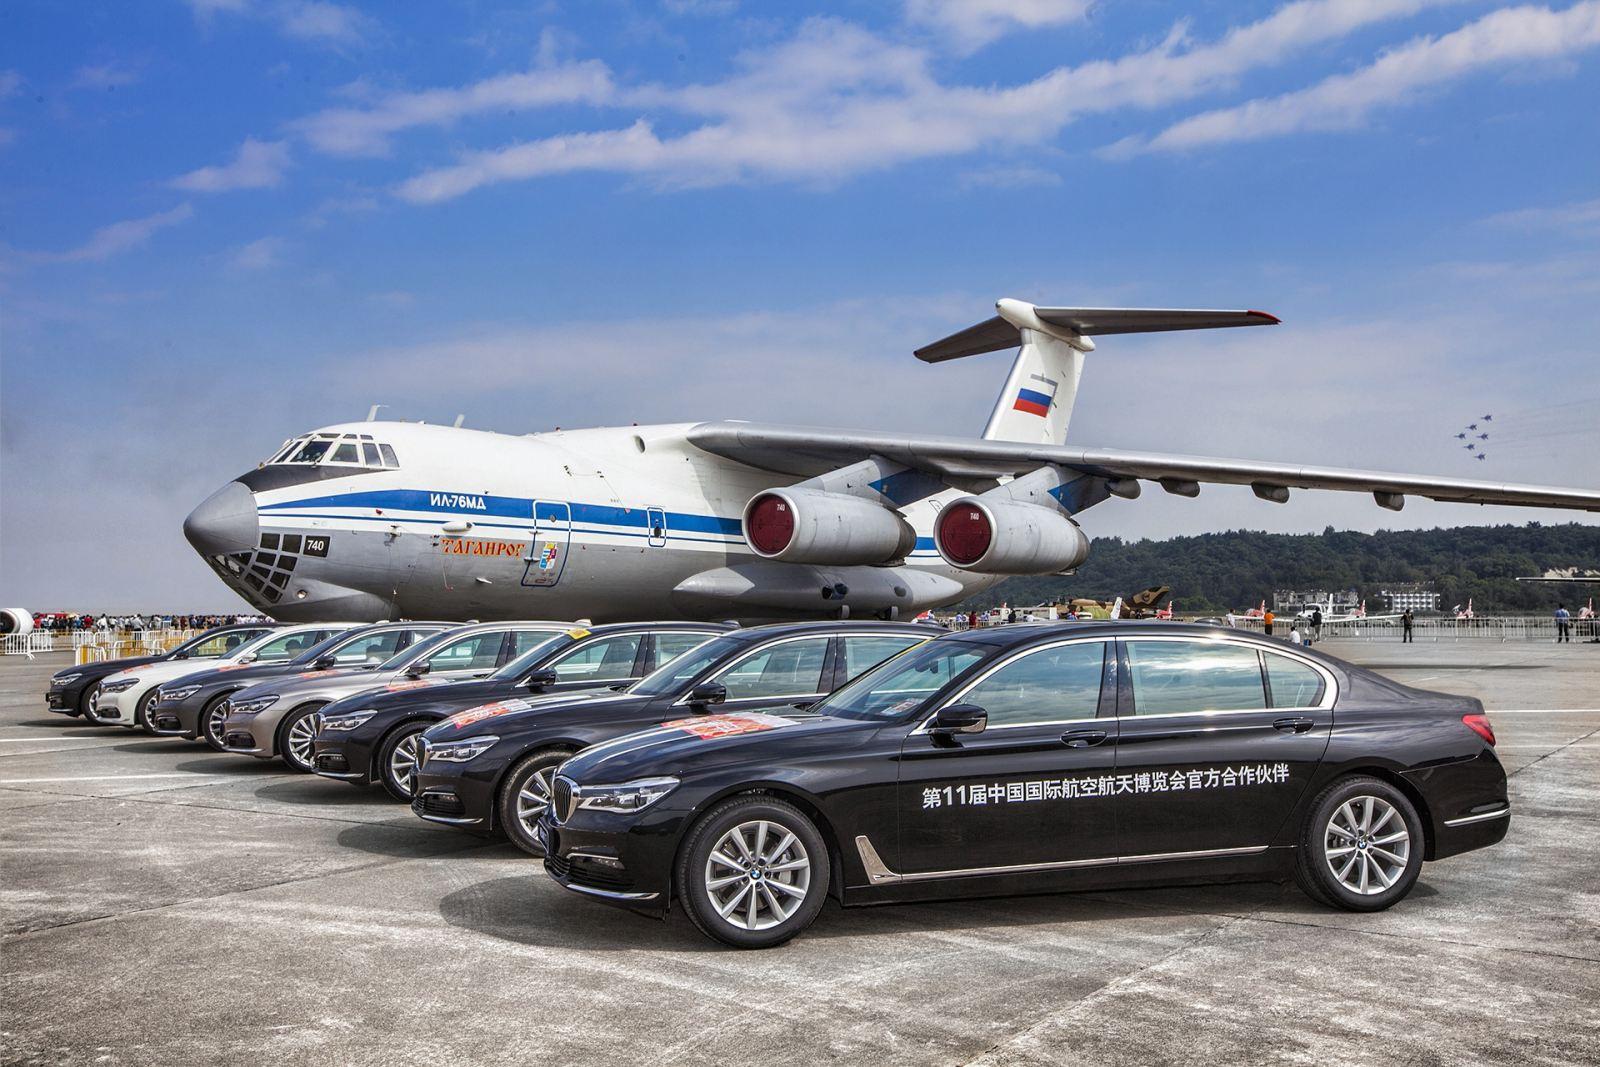 bmw成為中國航空航天博覽會合作伙伴圖片